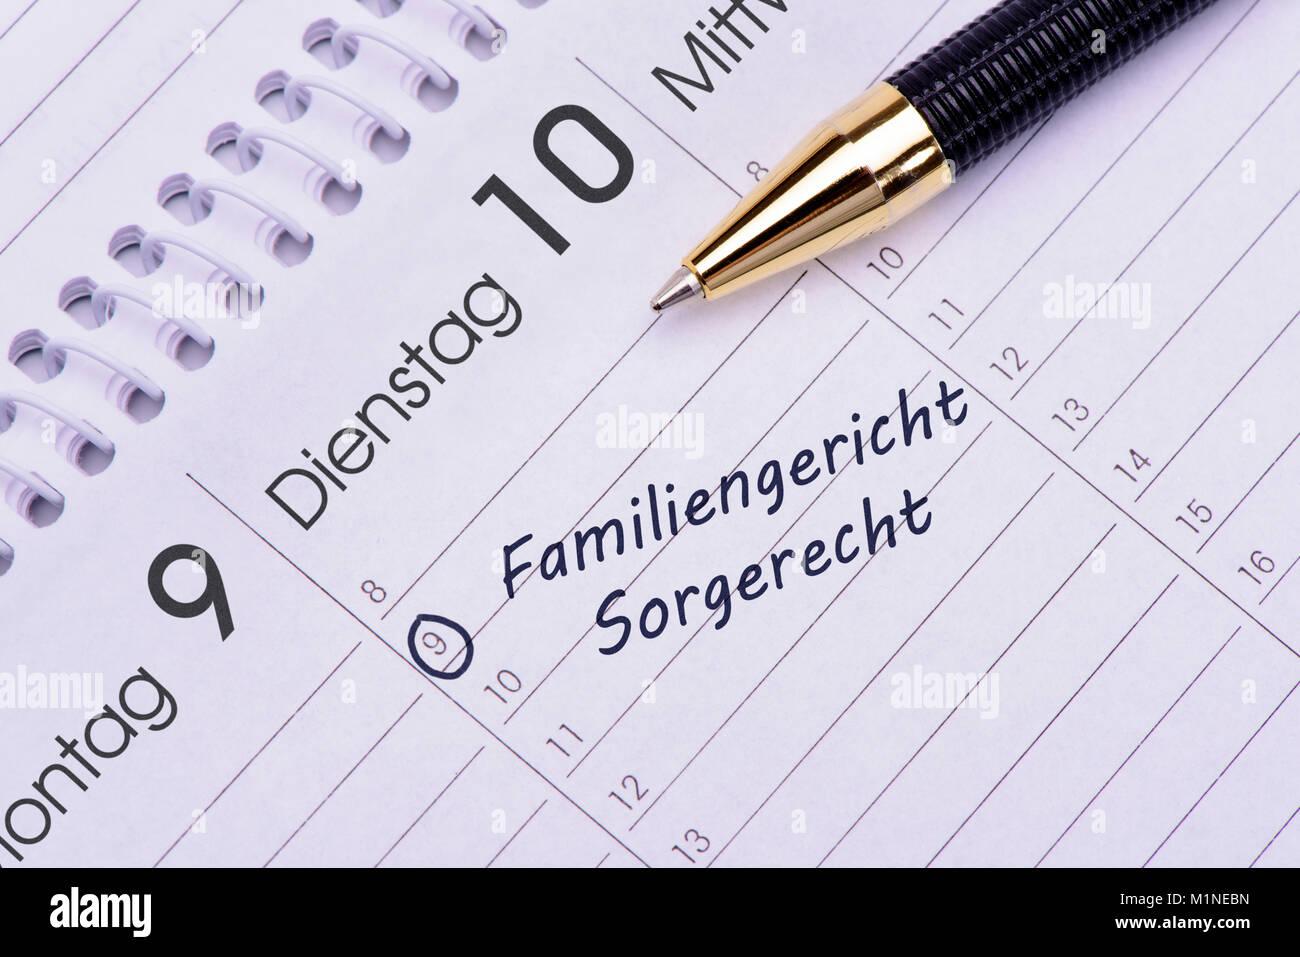 Familiengericht Sorgerecht Termin im Kalender - Stock Image